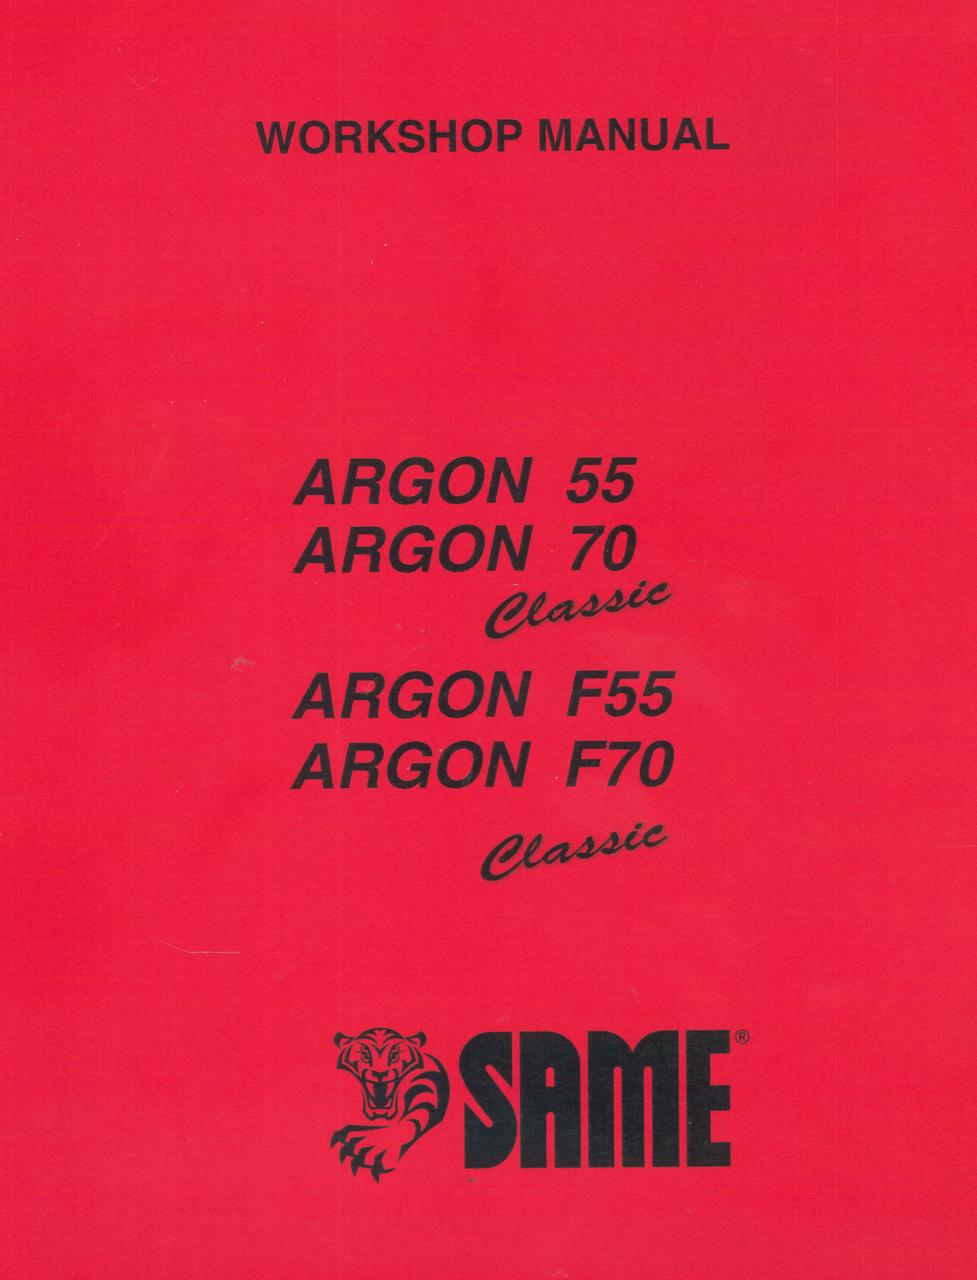 ARGON 55 CLASSIC - ARGON 70 CLASSIC - ARGON F 55 CLASSIC - ARGON F 70 CLASSIC - Workshop manual